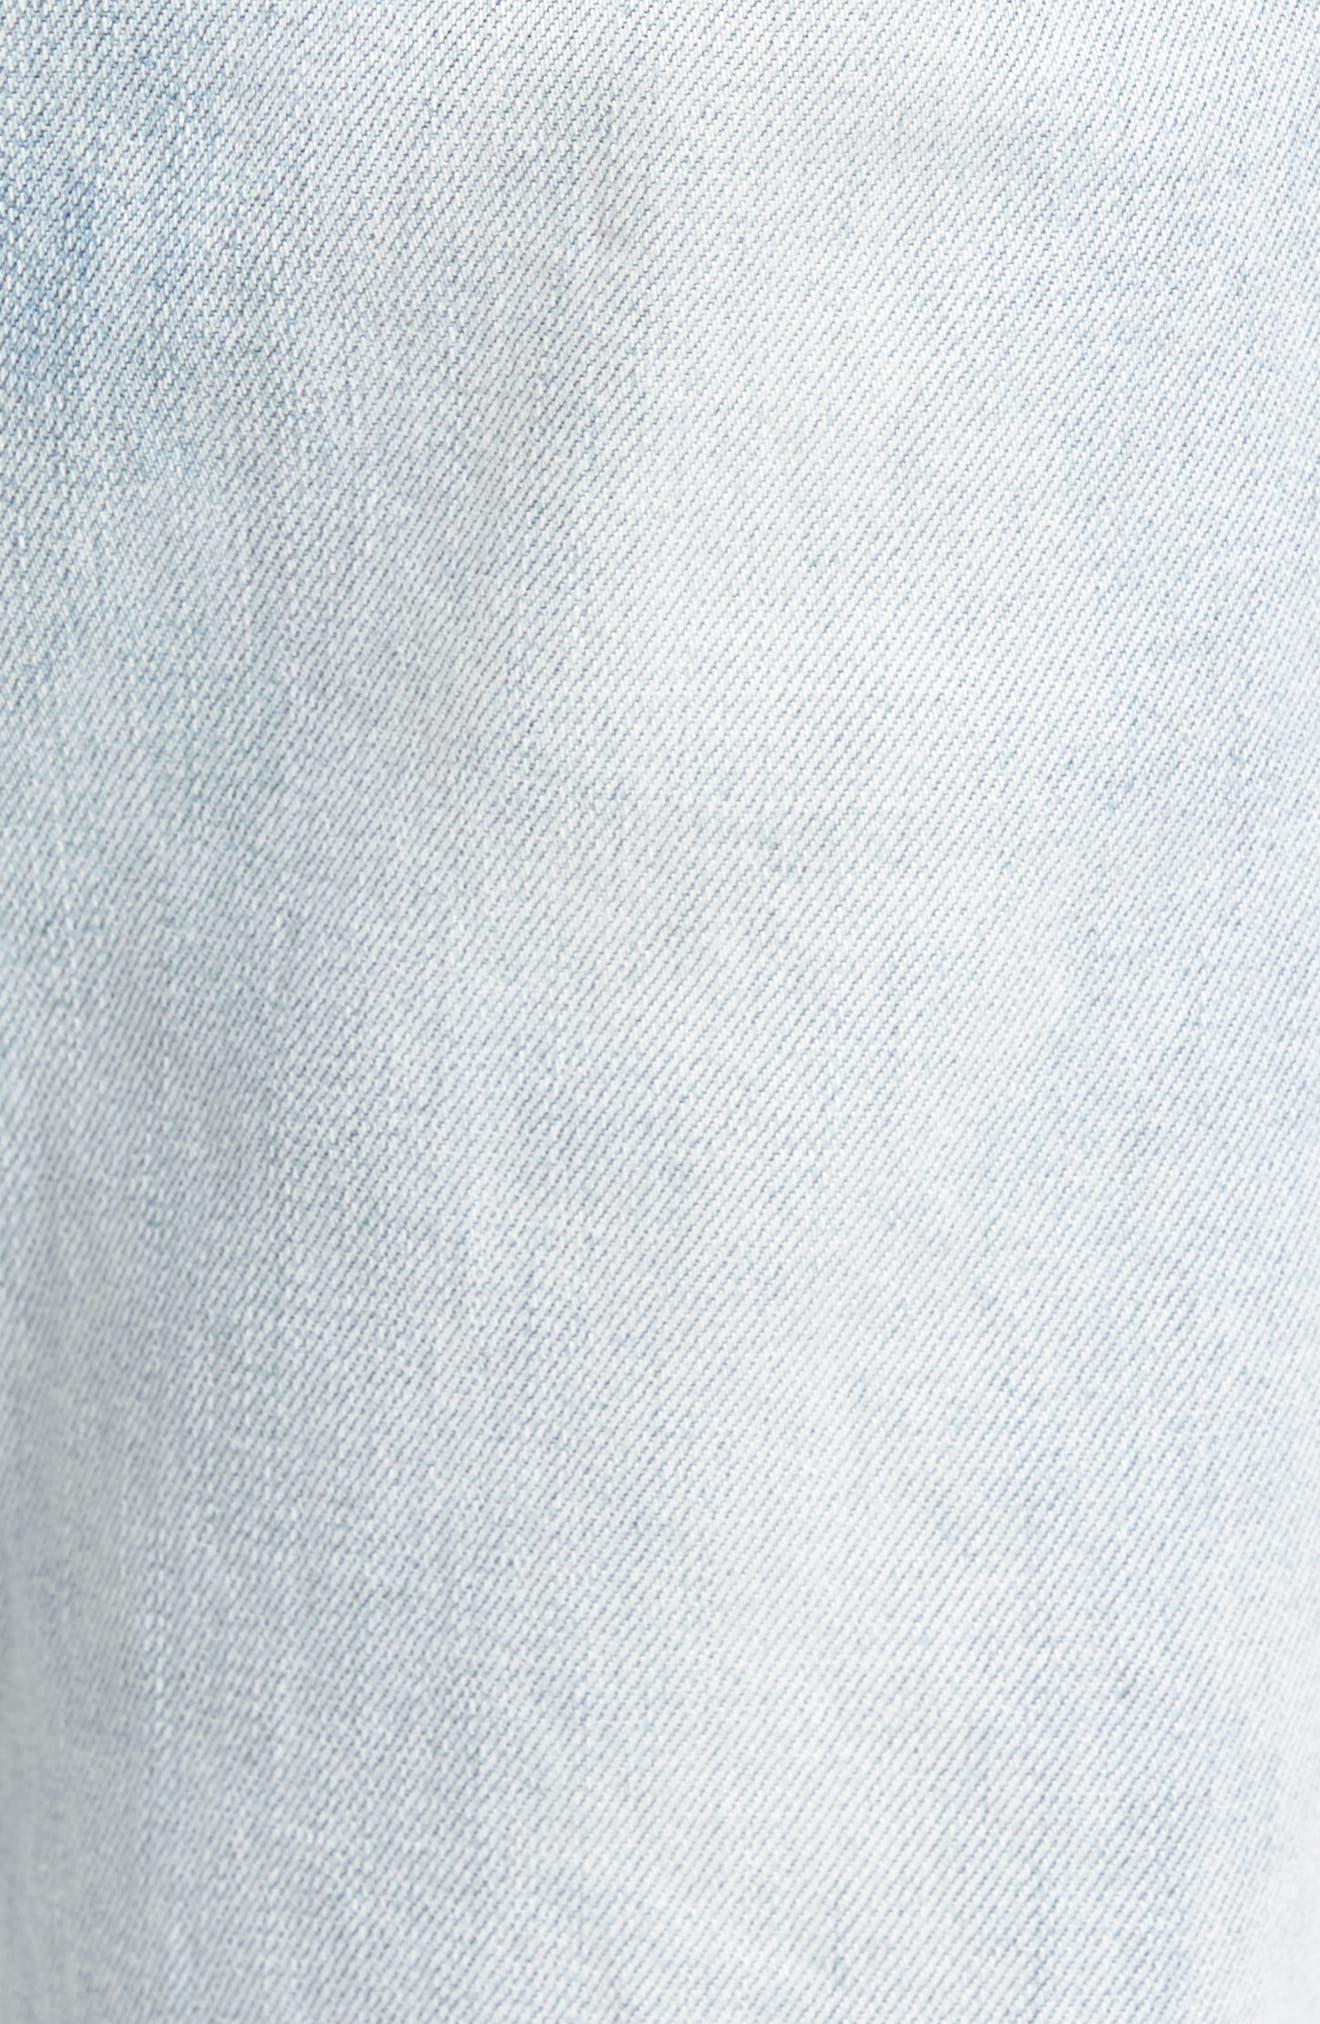 Sharpshot Slouchy Skinny Fit Denim Pants,                             Alternate thumbnail 10, color,